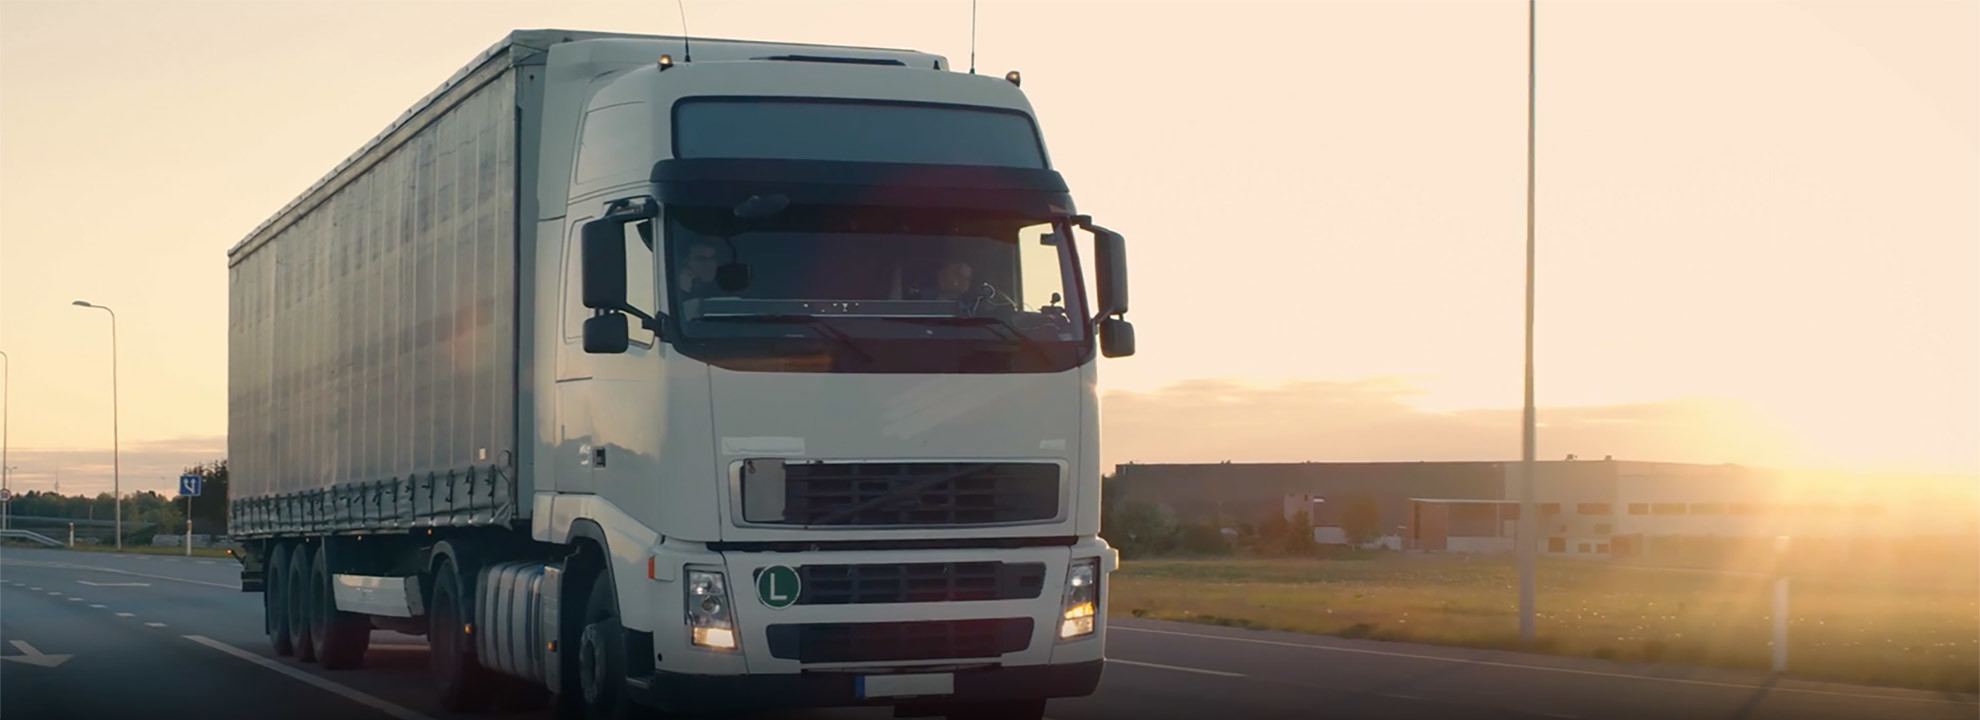 LIS Logistische Informationssysteme AG